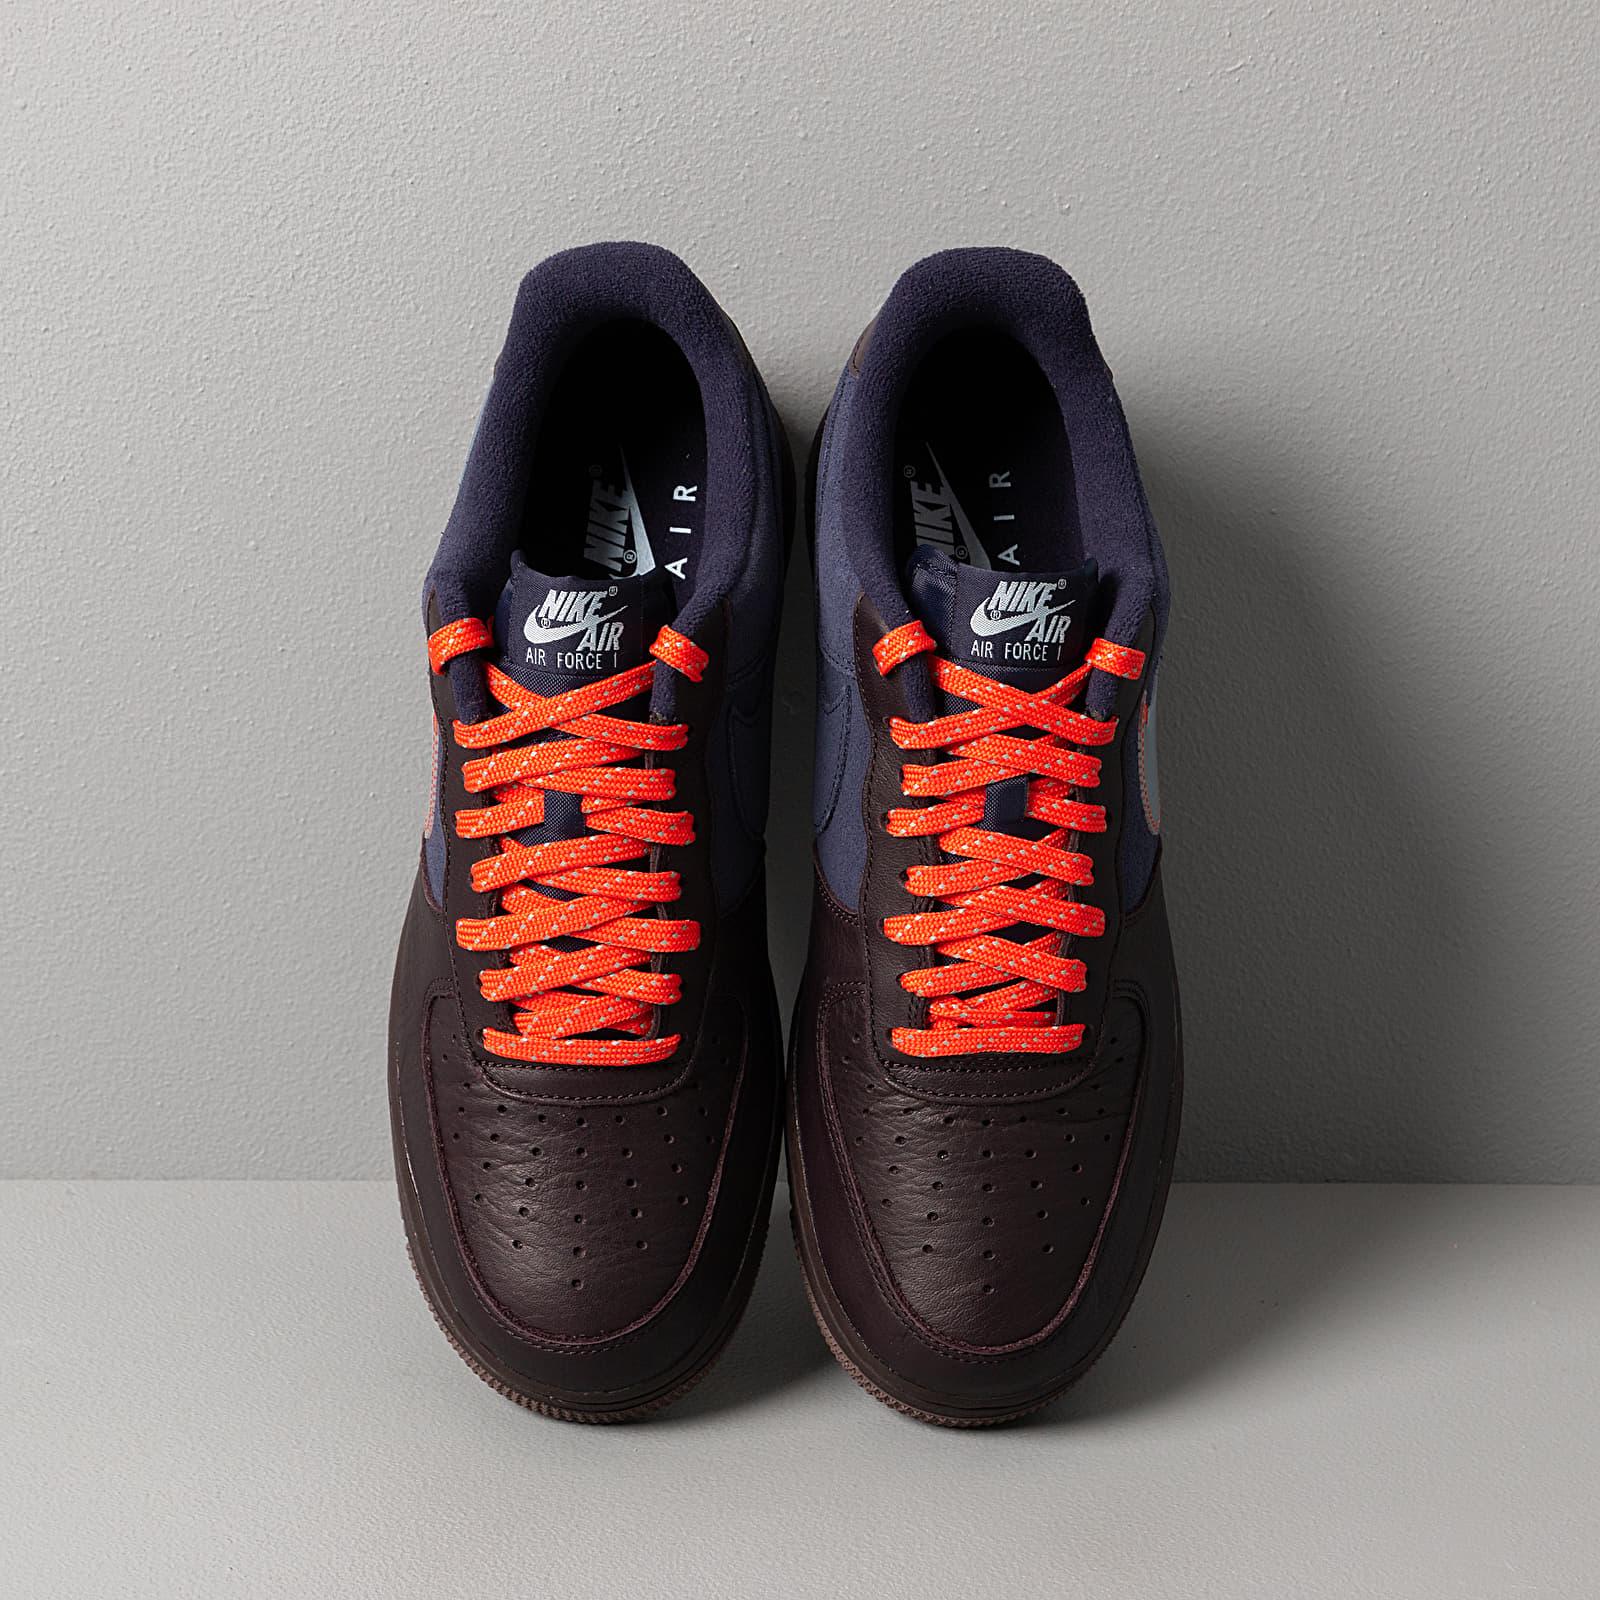 Nike Air Force 1 Premium Burgundy Ash Celestine Blue | Footshop